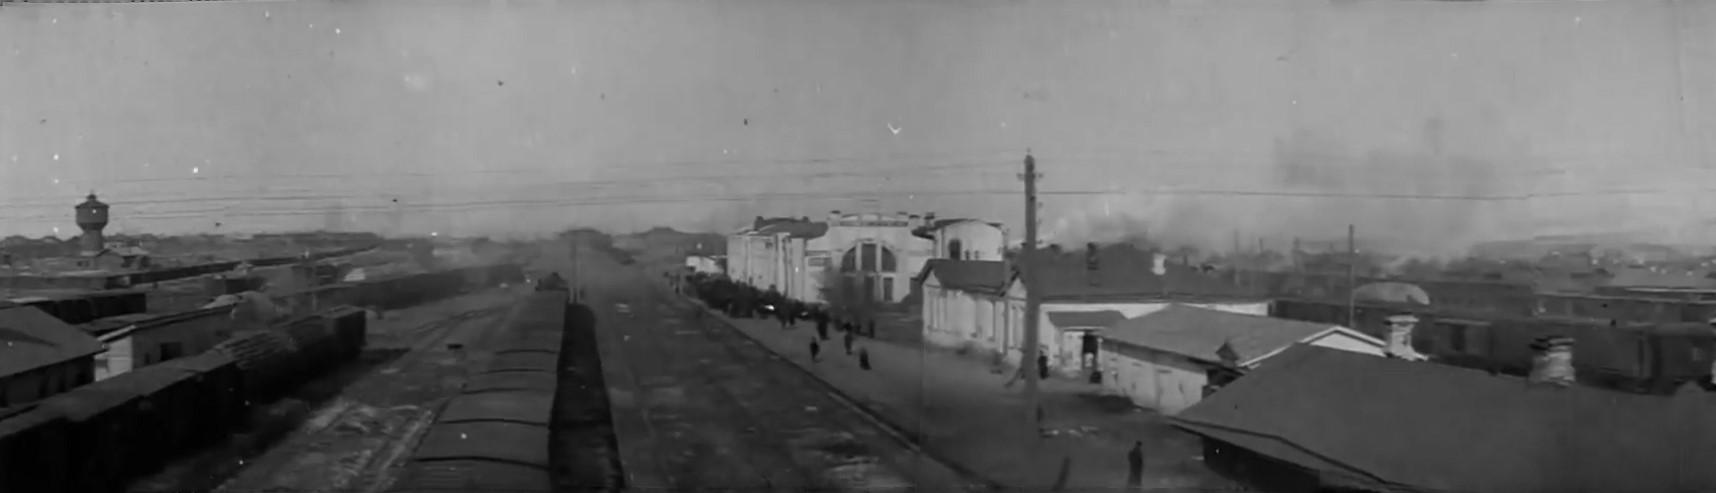 https://upload.wikimedia.org/wikipedia/commons/8/83/Novonikolaevsk_railway_station_1919_%28cropped%29.jpg